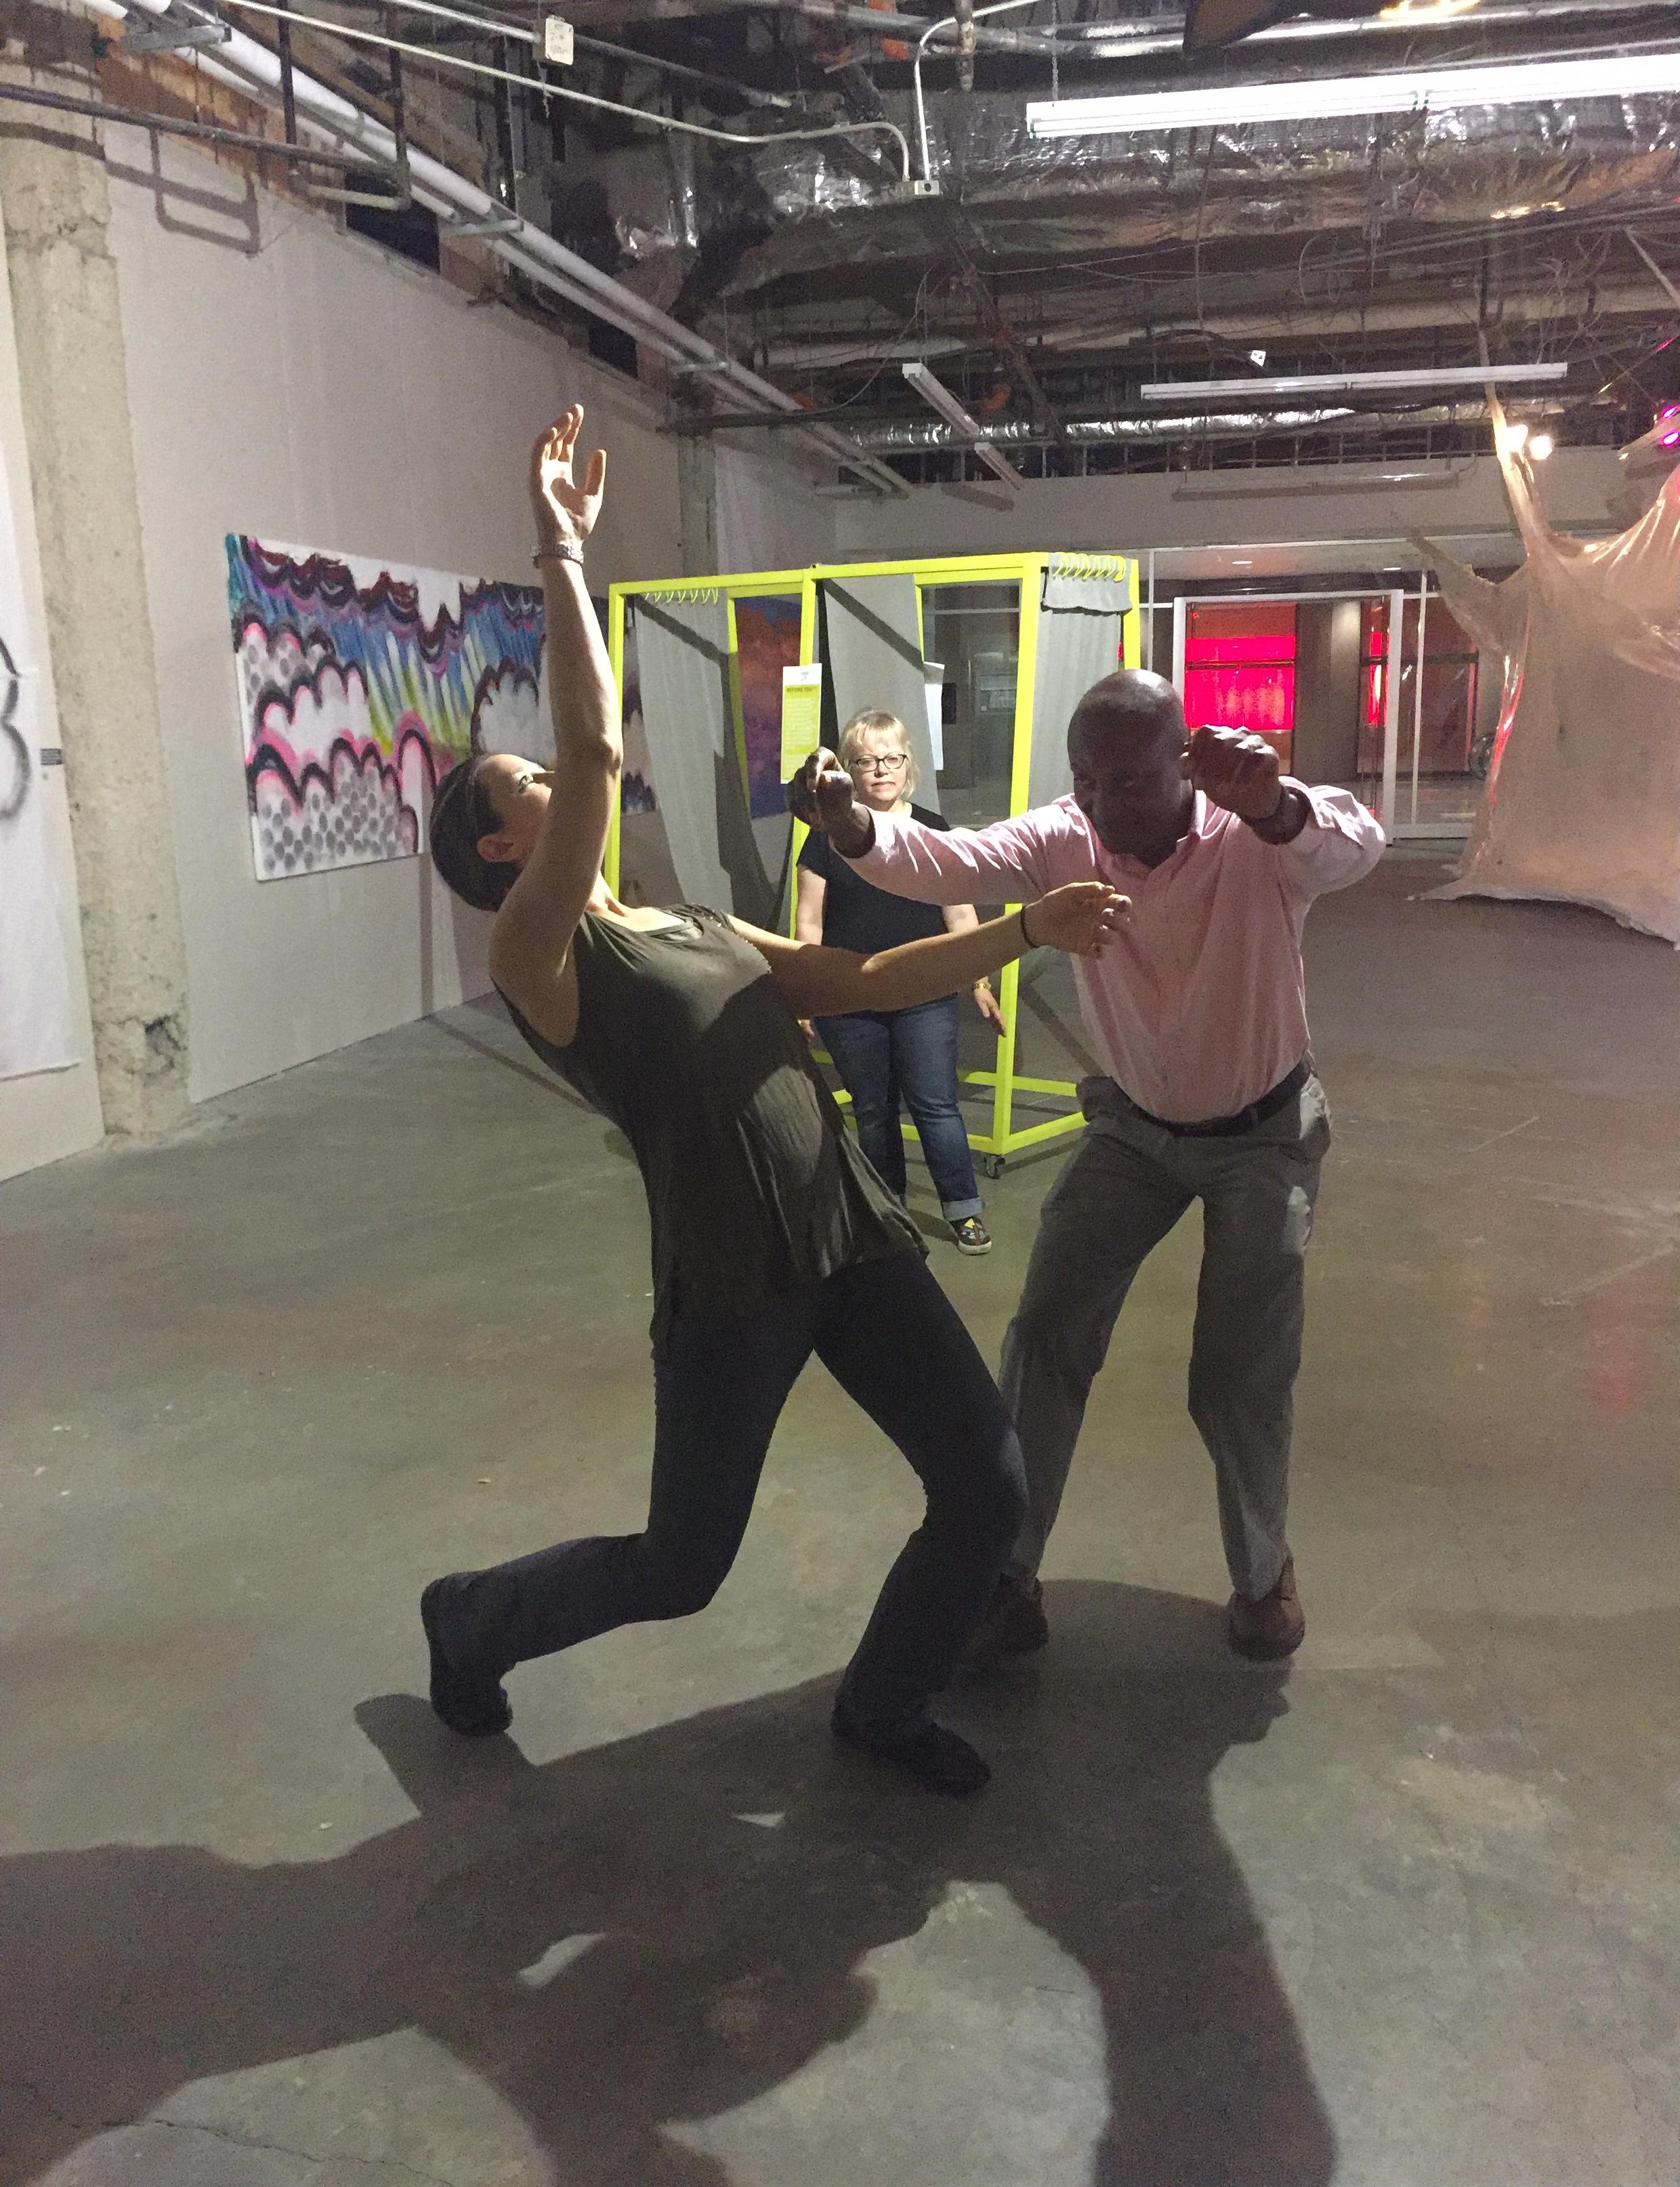 Tera Kilbride leads Freeflow Yoga + VR